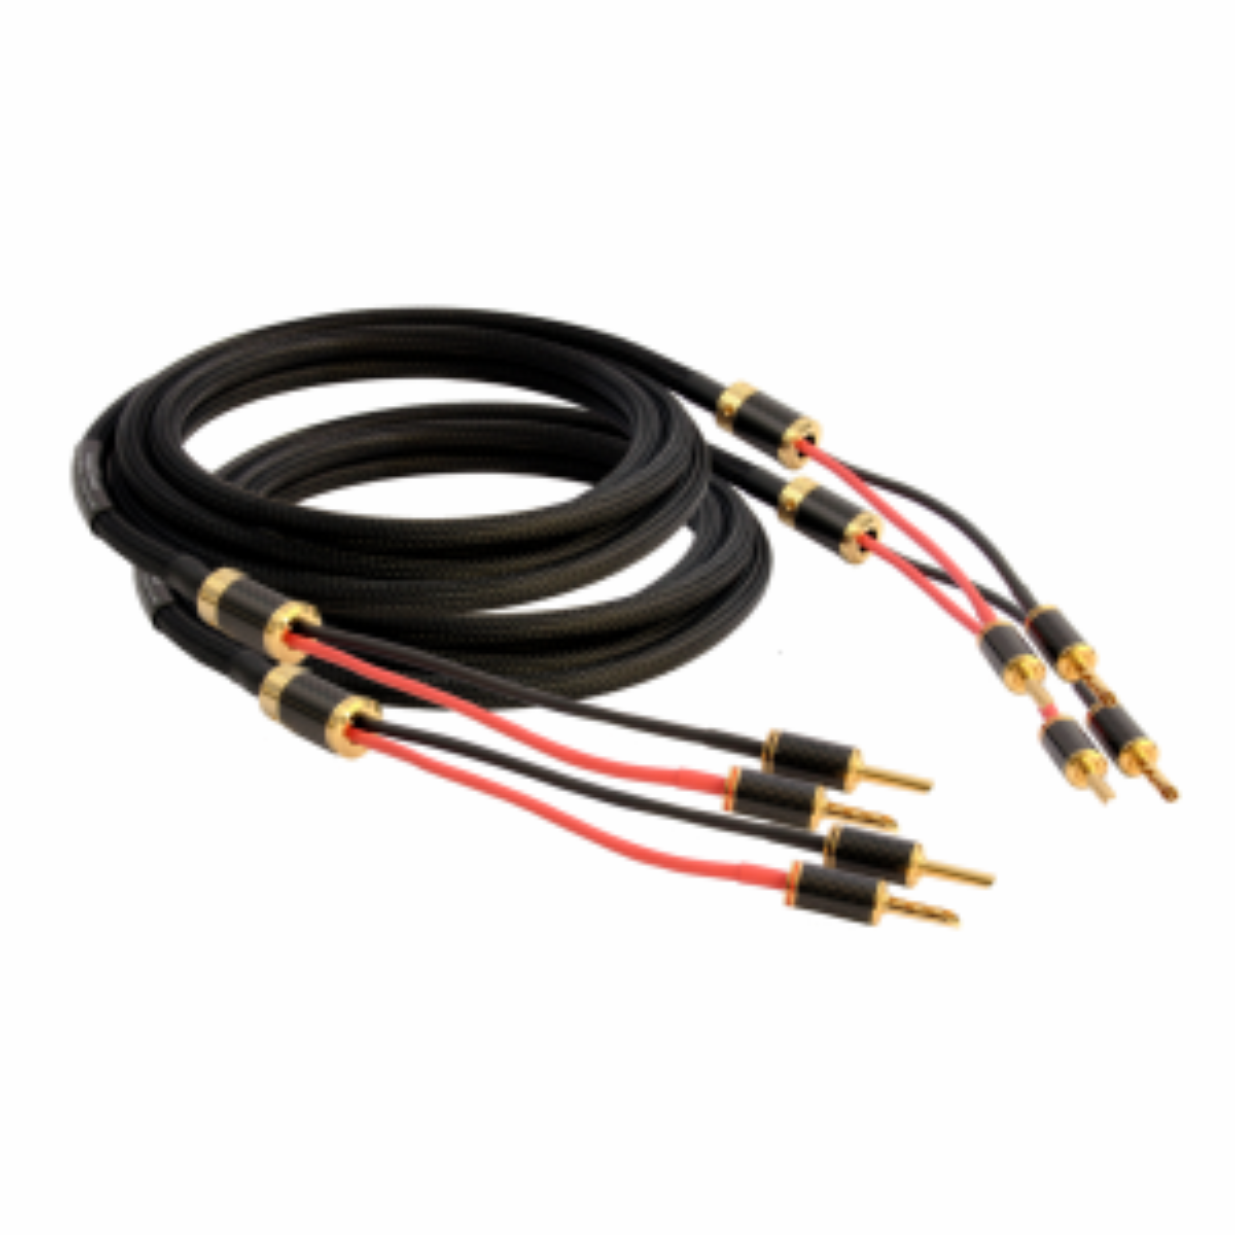 Кабель акустический Goldkabel Black Edition SC Single-Wire 3,5m